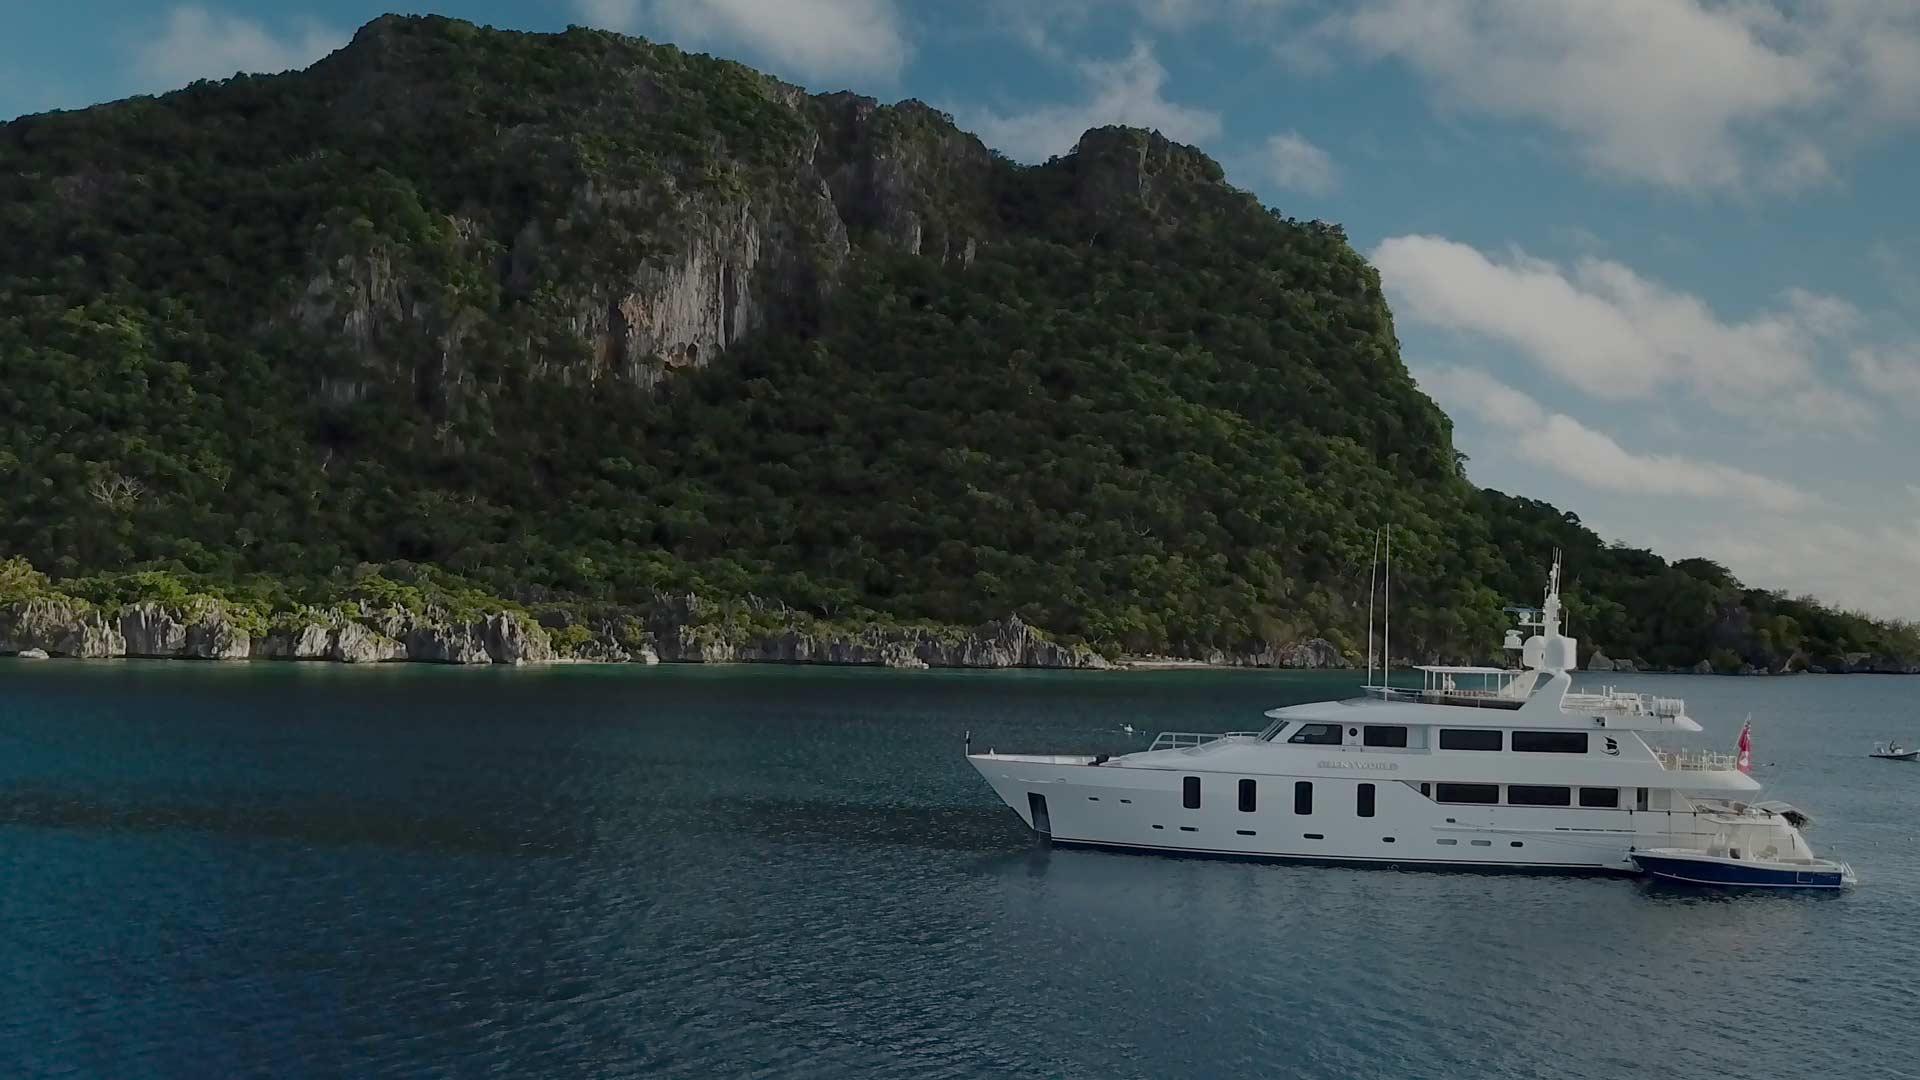 Adagold Luxe French Polynesia Escape